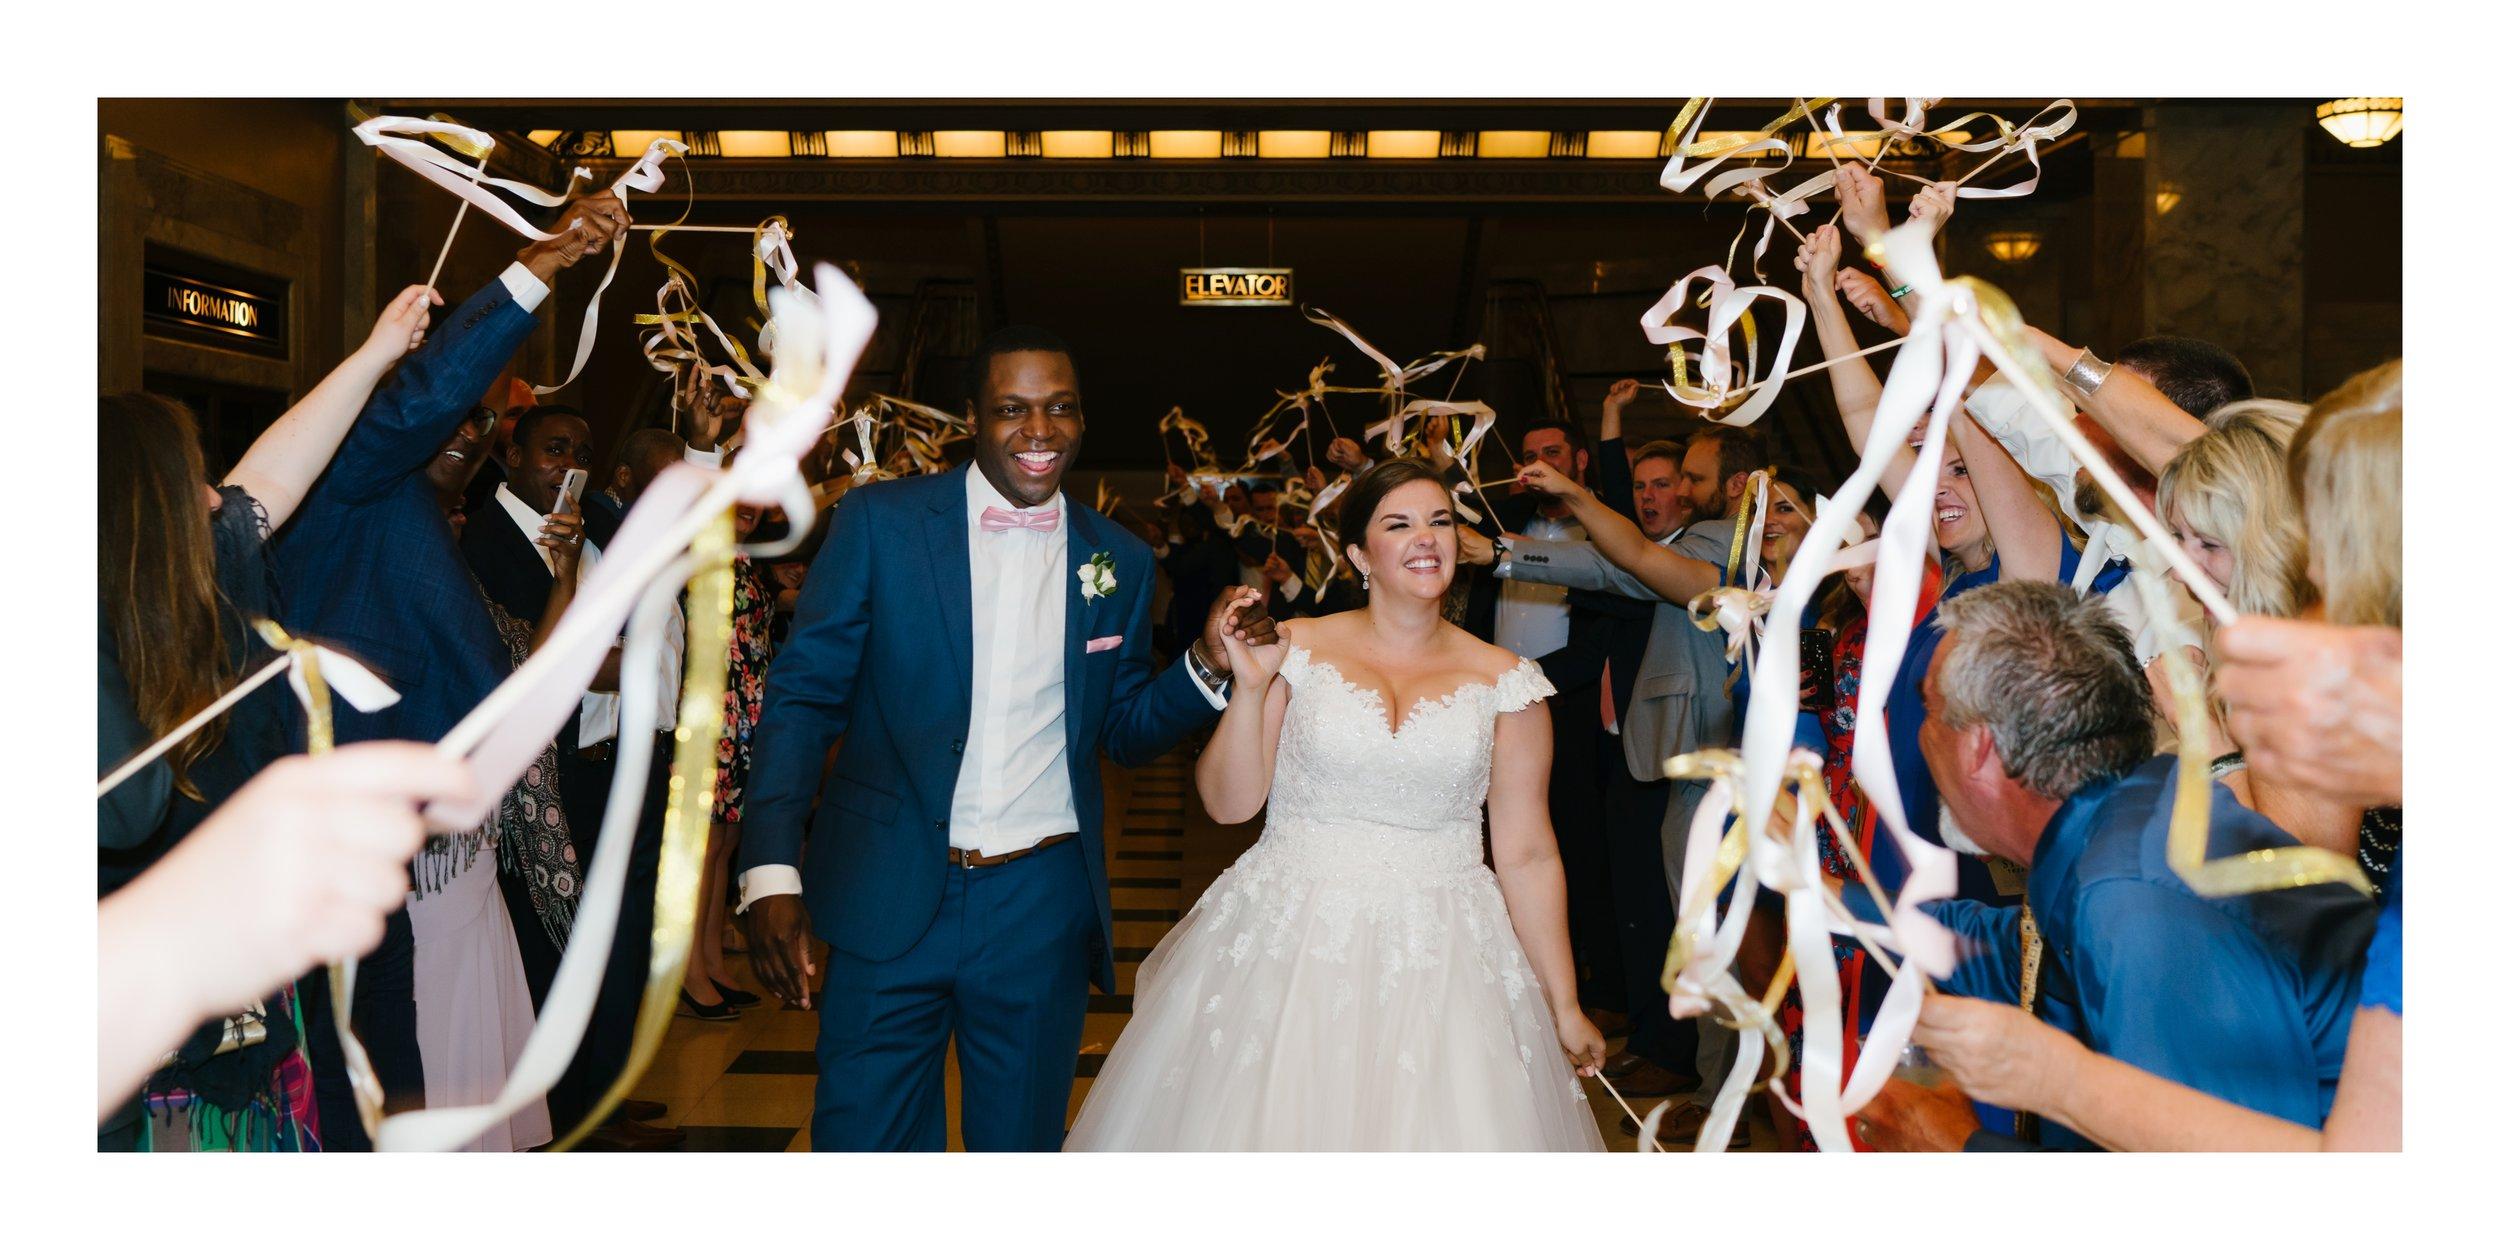 wedding exit ideas